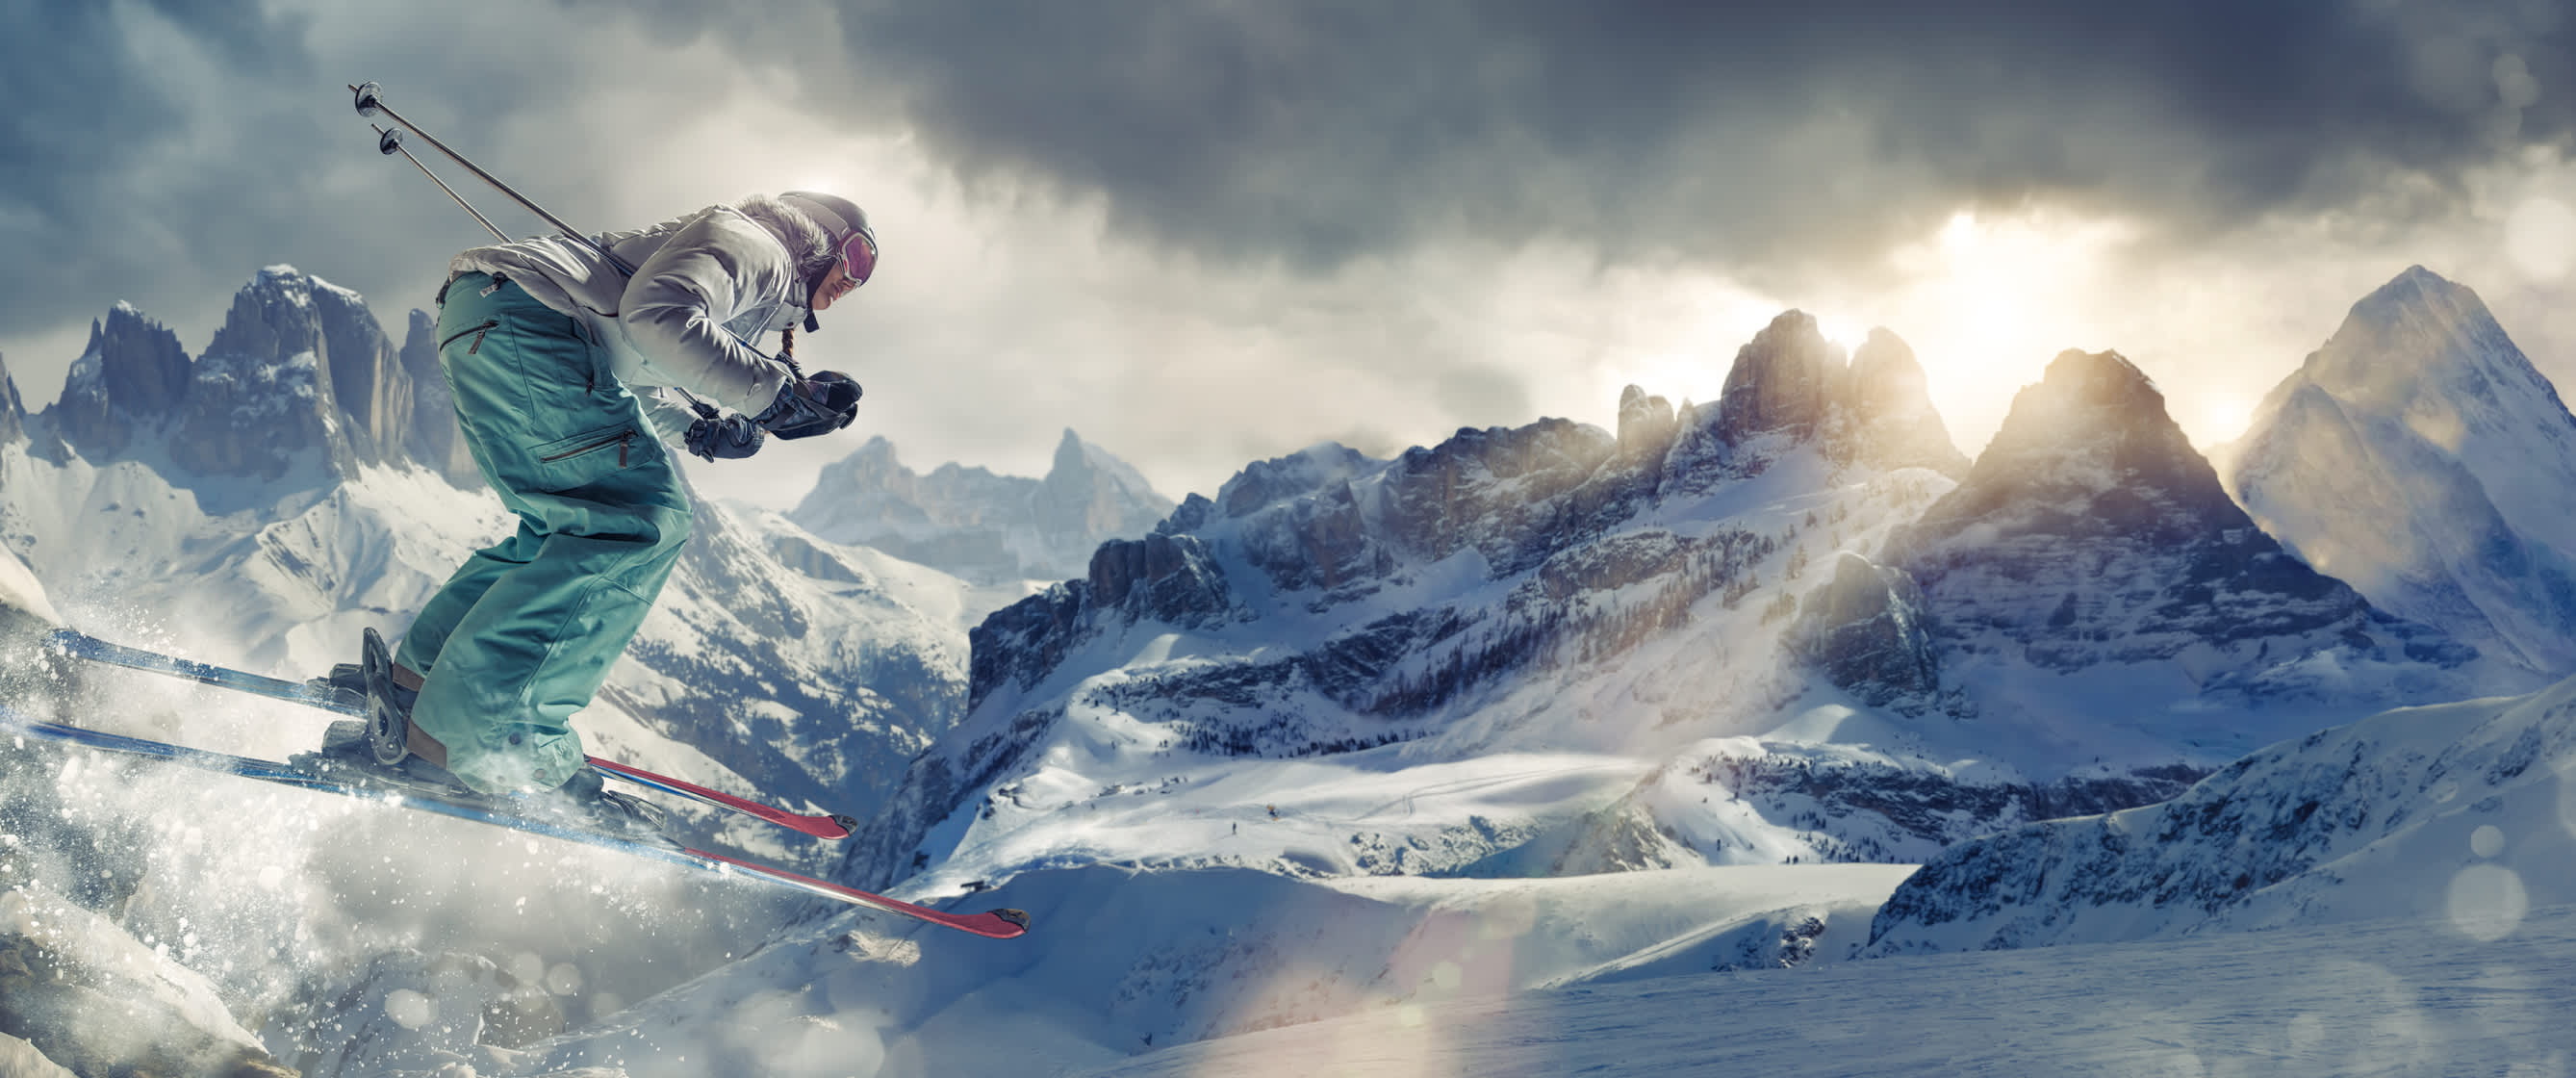 How to ski Zermatt, Niseko, Whistler, Aspen and Northern Iceland in one trip